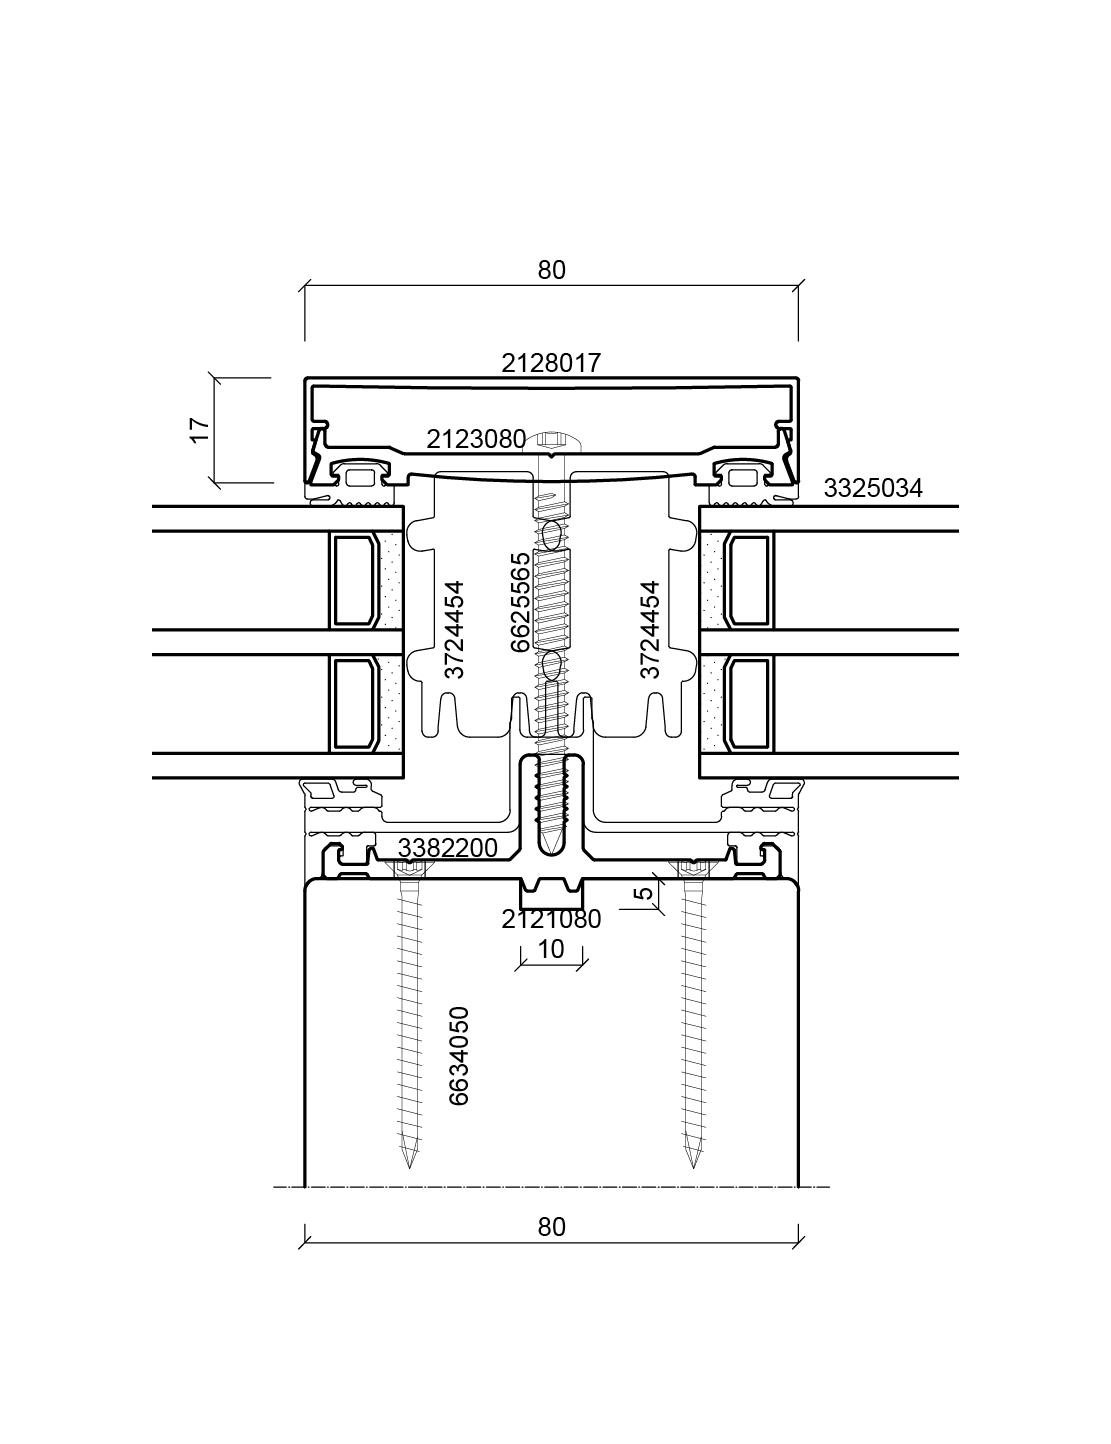 batimet holz aluminium pfosten riegel tm80 se. Black Bedroom Furniture Sets. Home Design Ideas